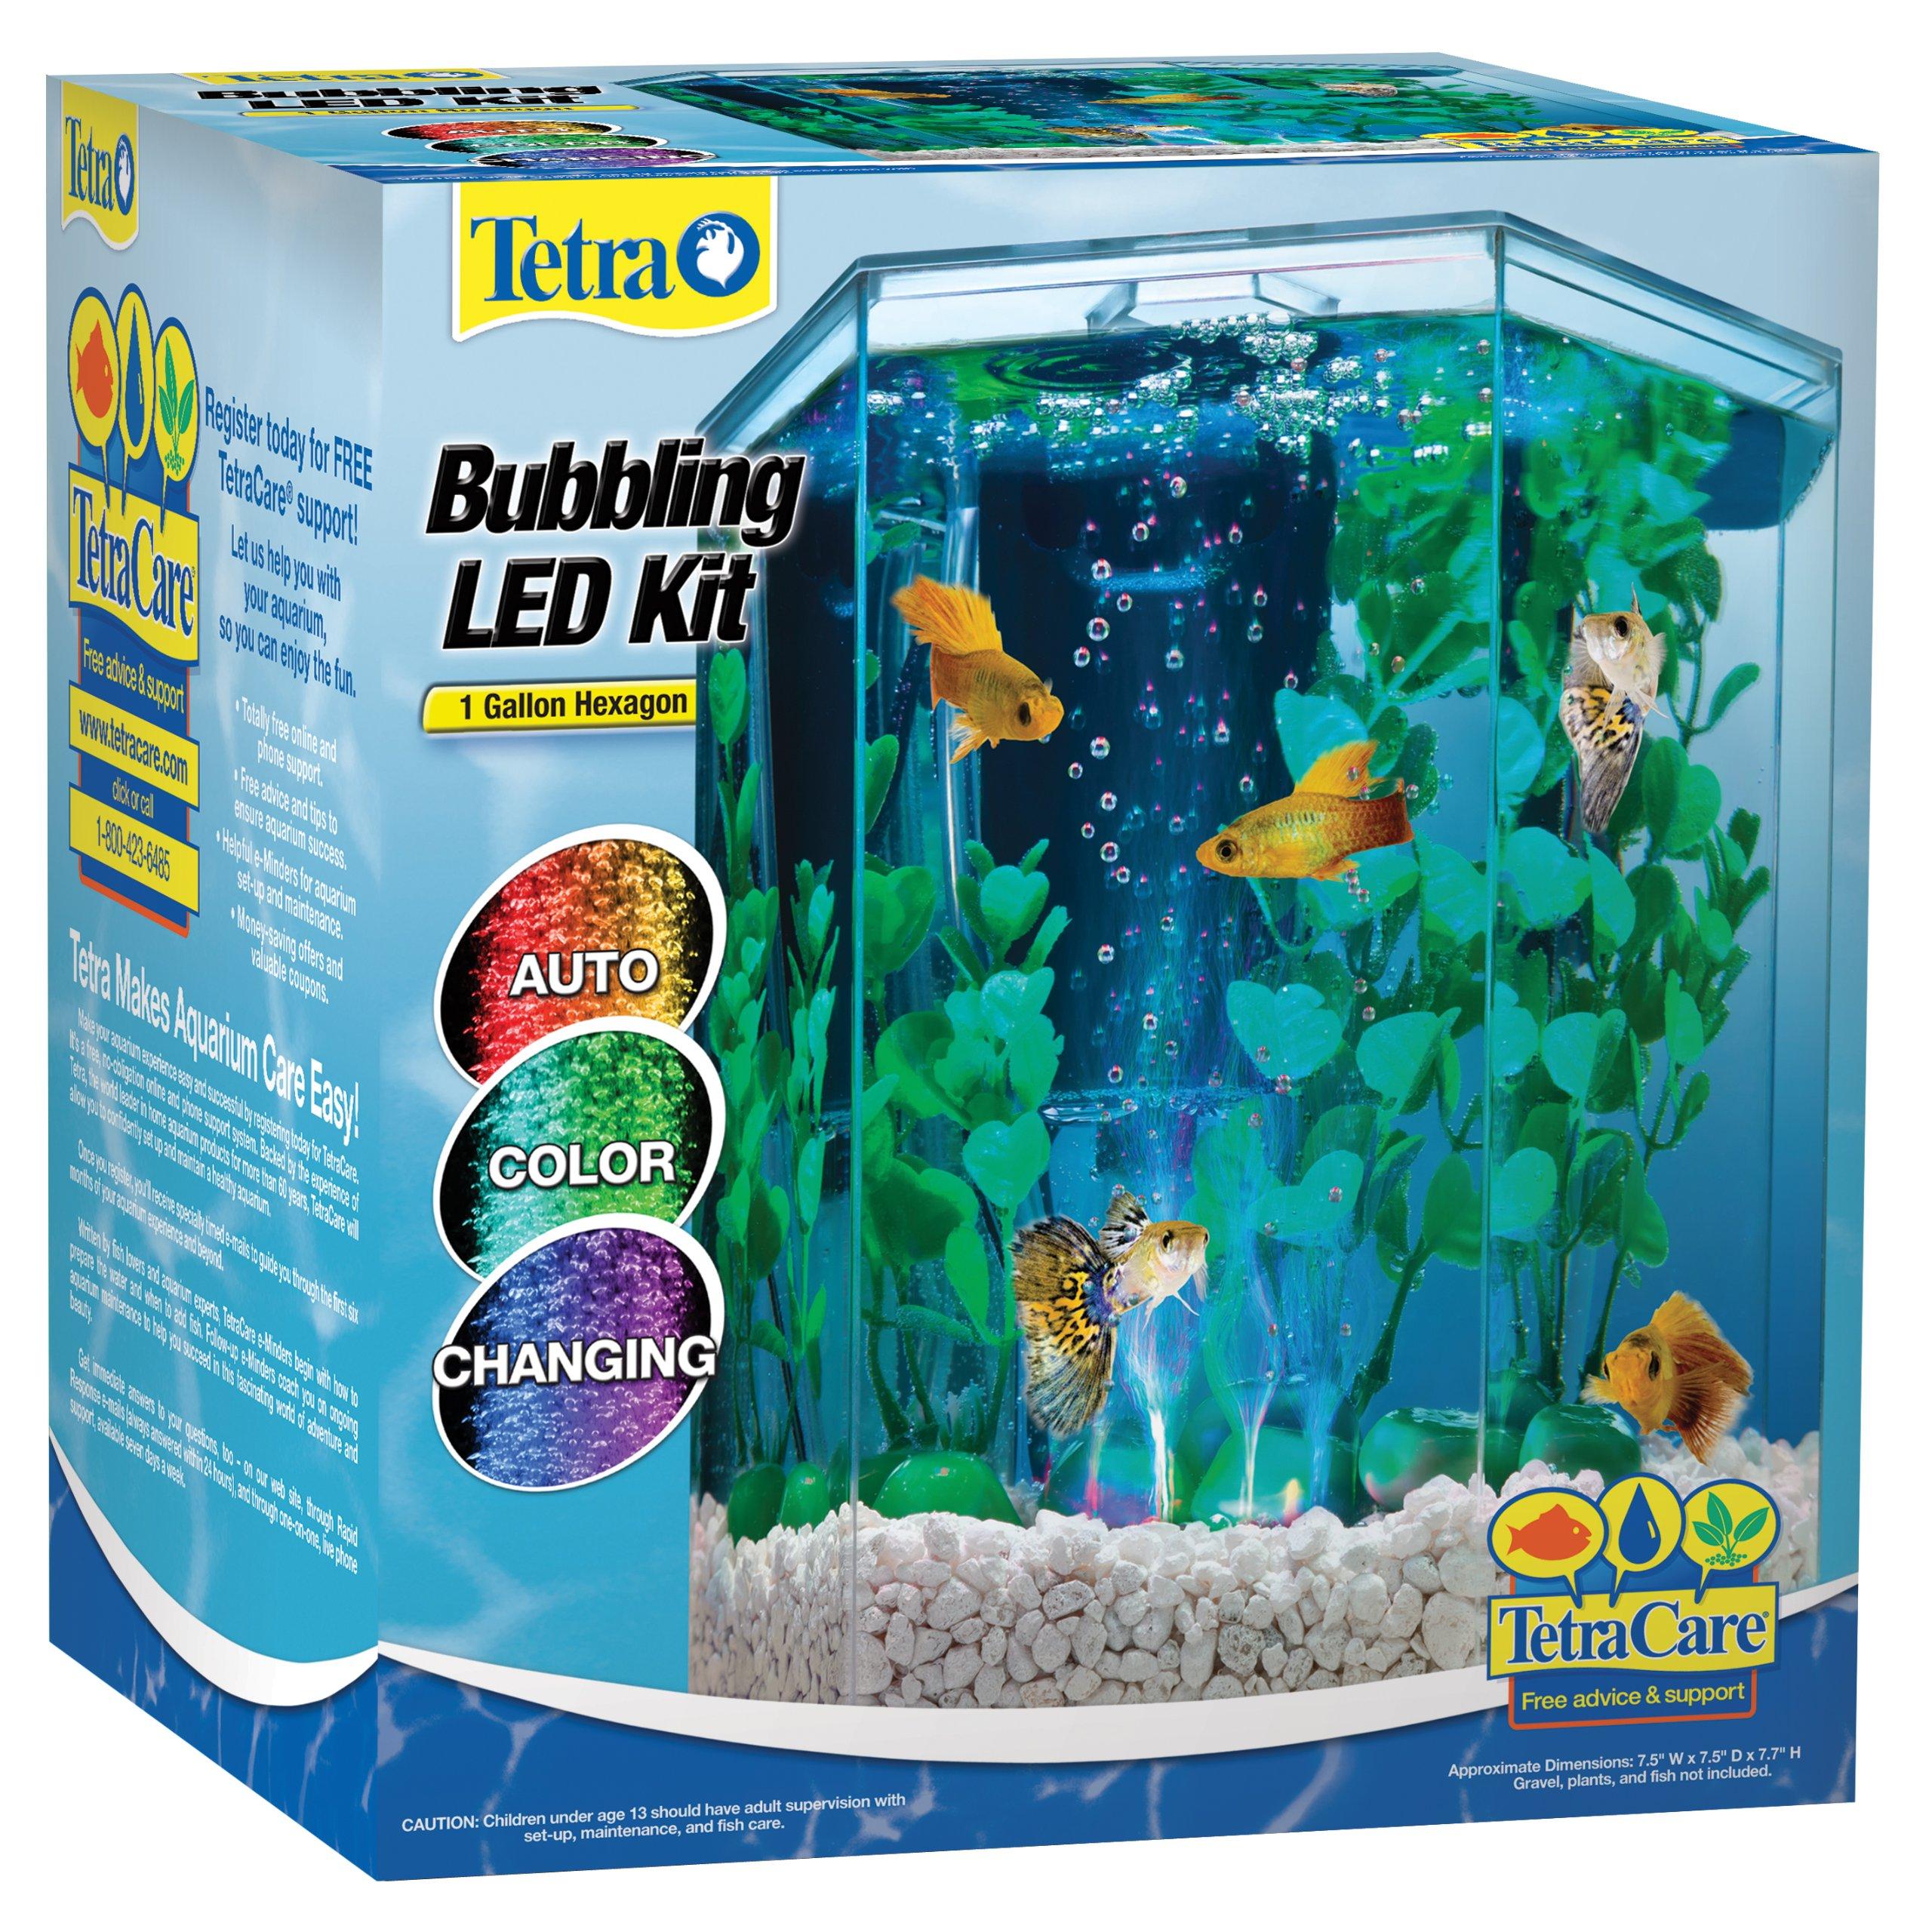 Tetra 29040 Hexagon Aquarium Kit with LED Bubbler, 1-Gallon (Packaging may vary) by Tetra